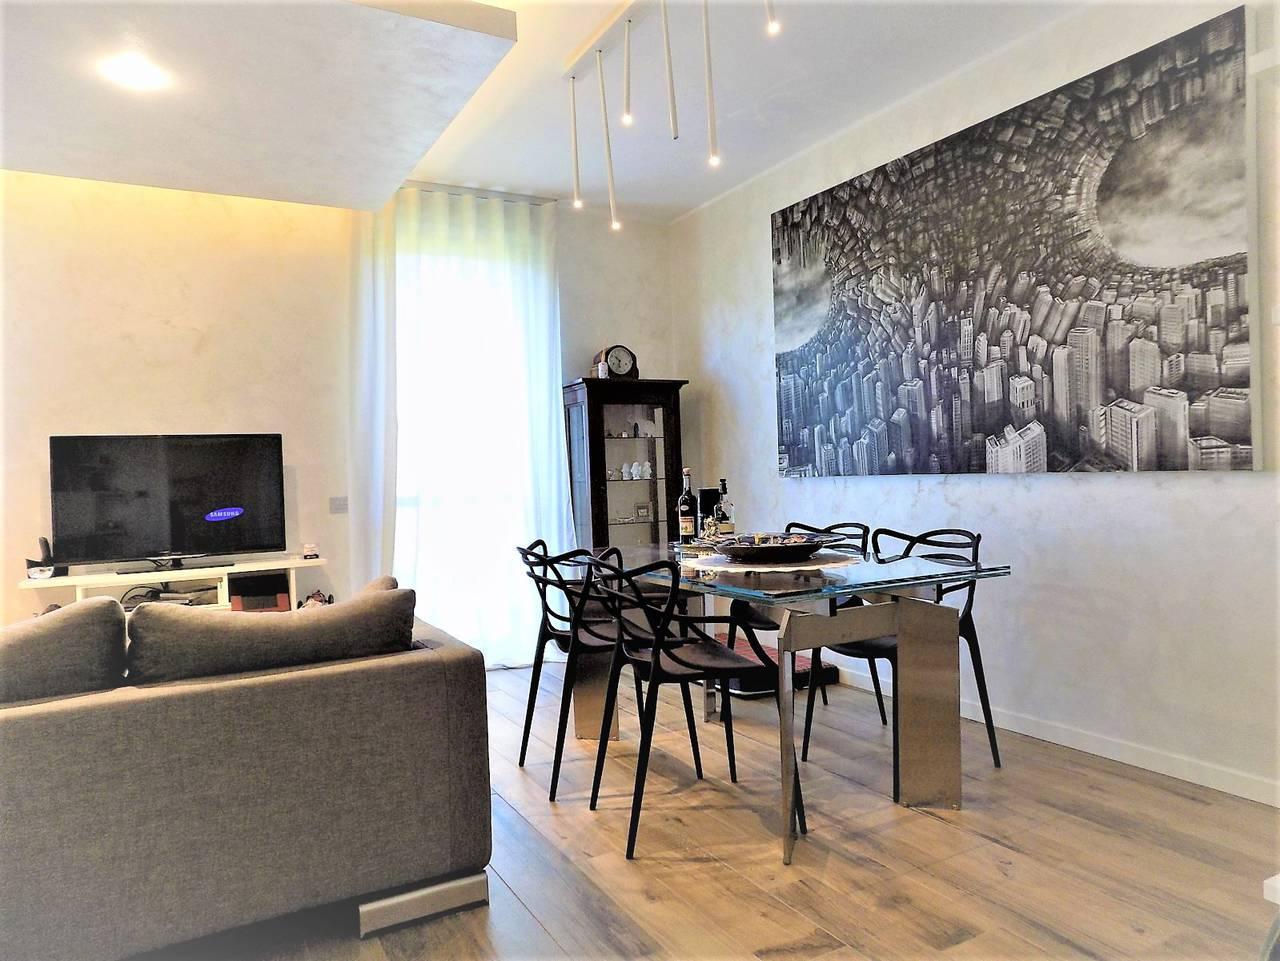 Porzione-villa-bifamigliare-ristrutturata-in-vendita-a-Carnate-6